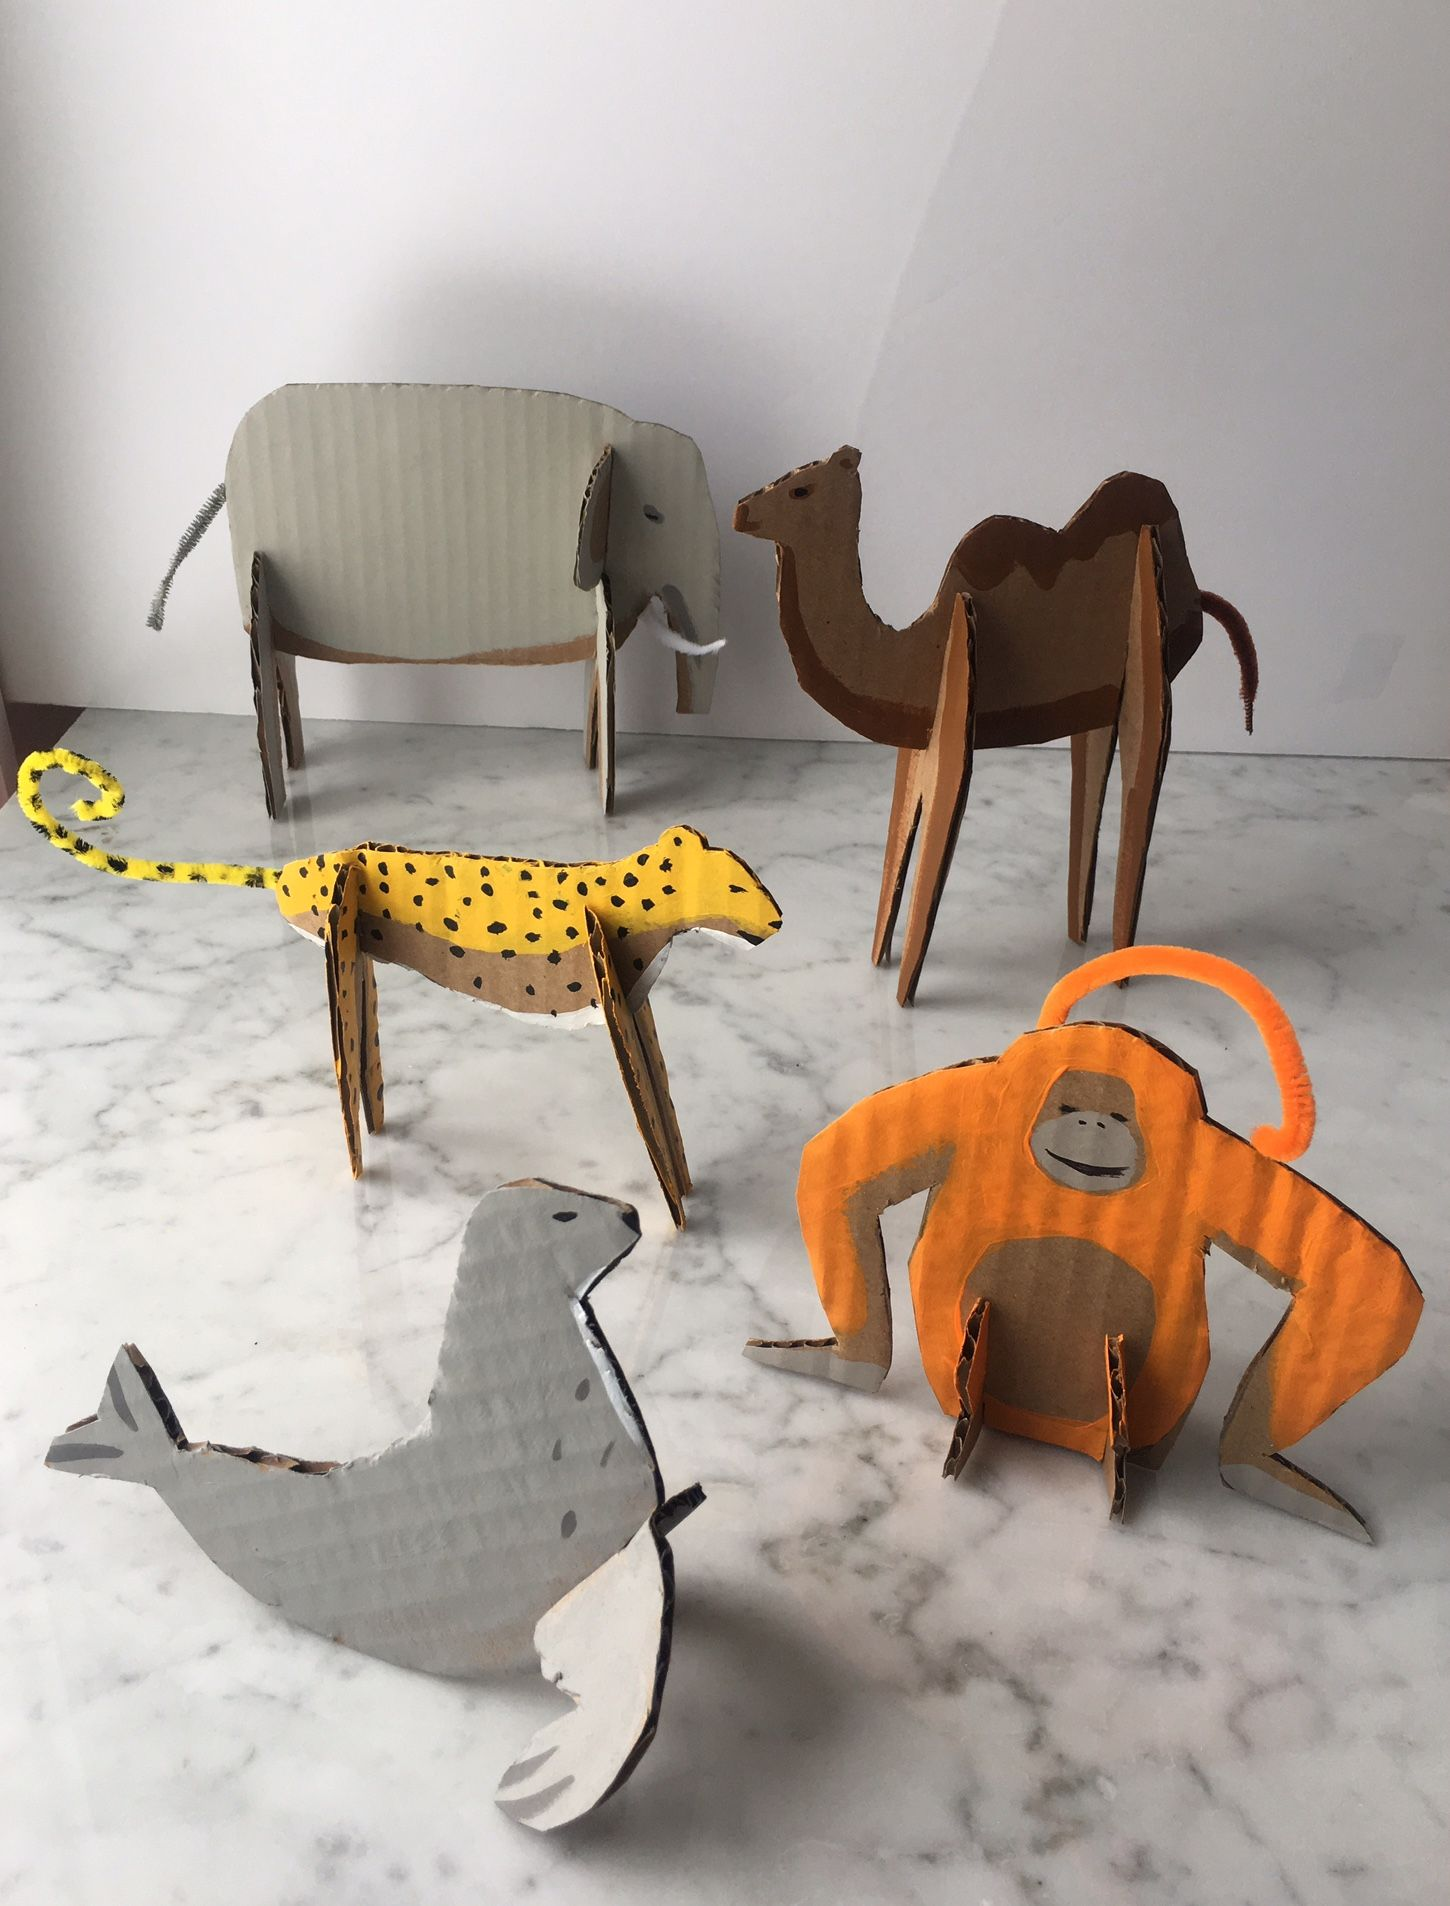 Recycled Cardboard Zoo Animals 2019 Teach Art Cardboard Art